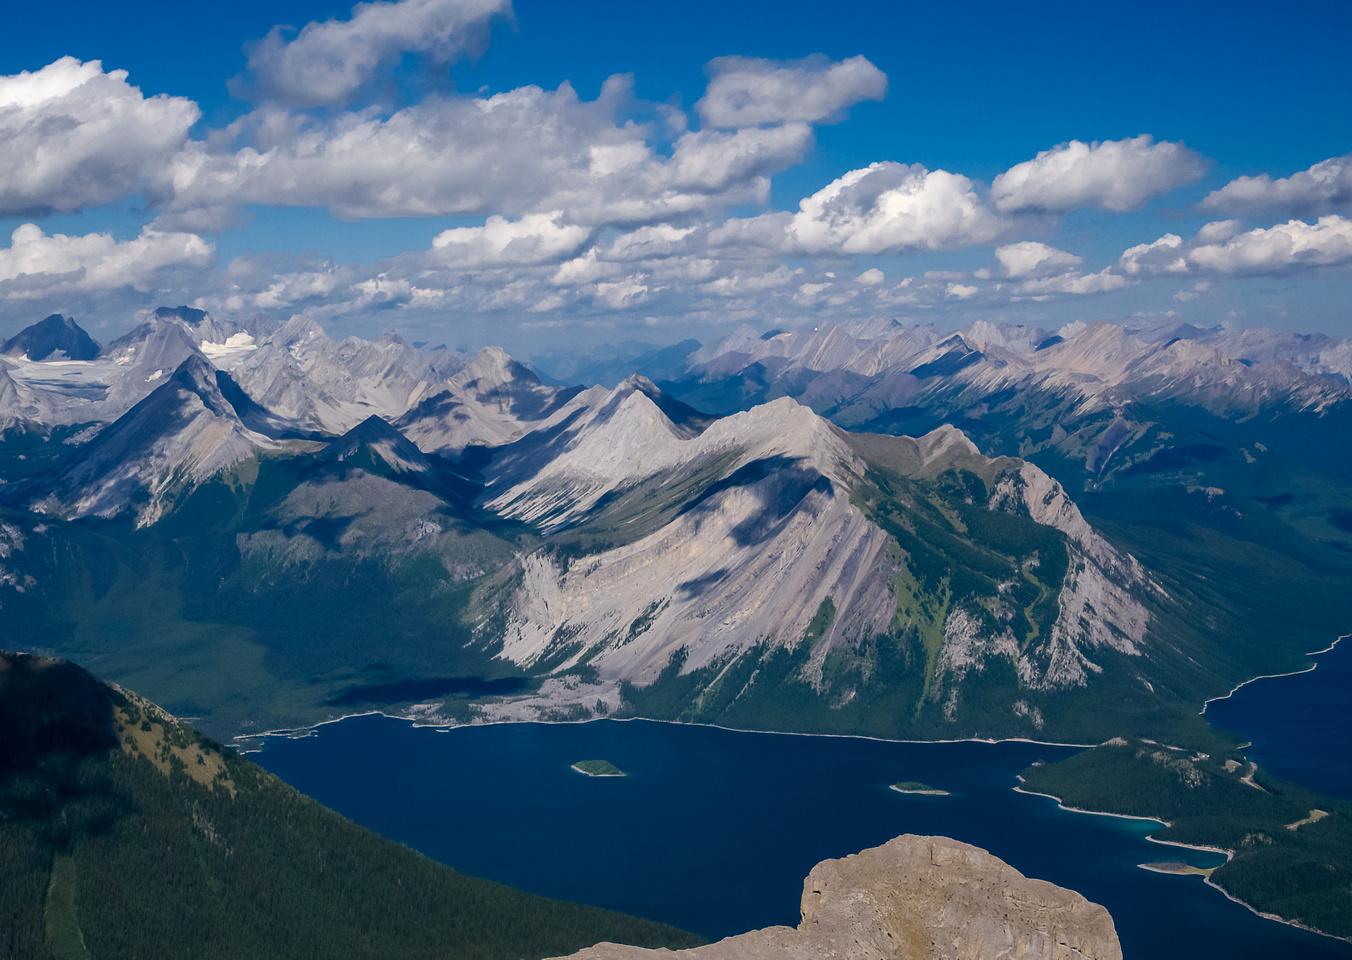 Looking over the Turret and Upper Kananaskis Lake to Mount Indefatigable, Invincible, Warspite, Nomad, Hermione Peak